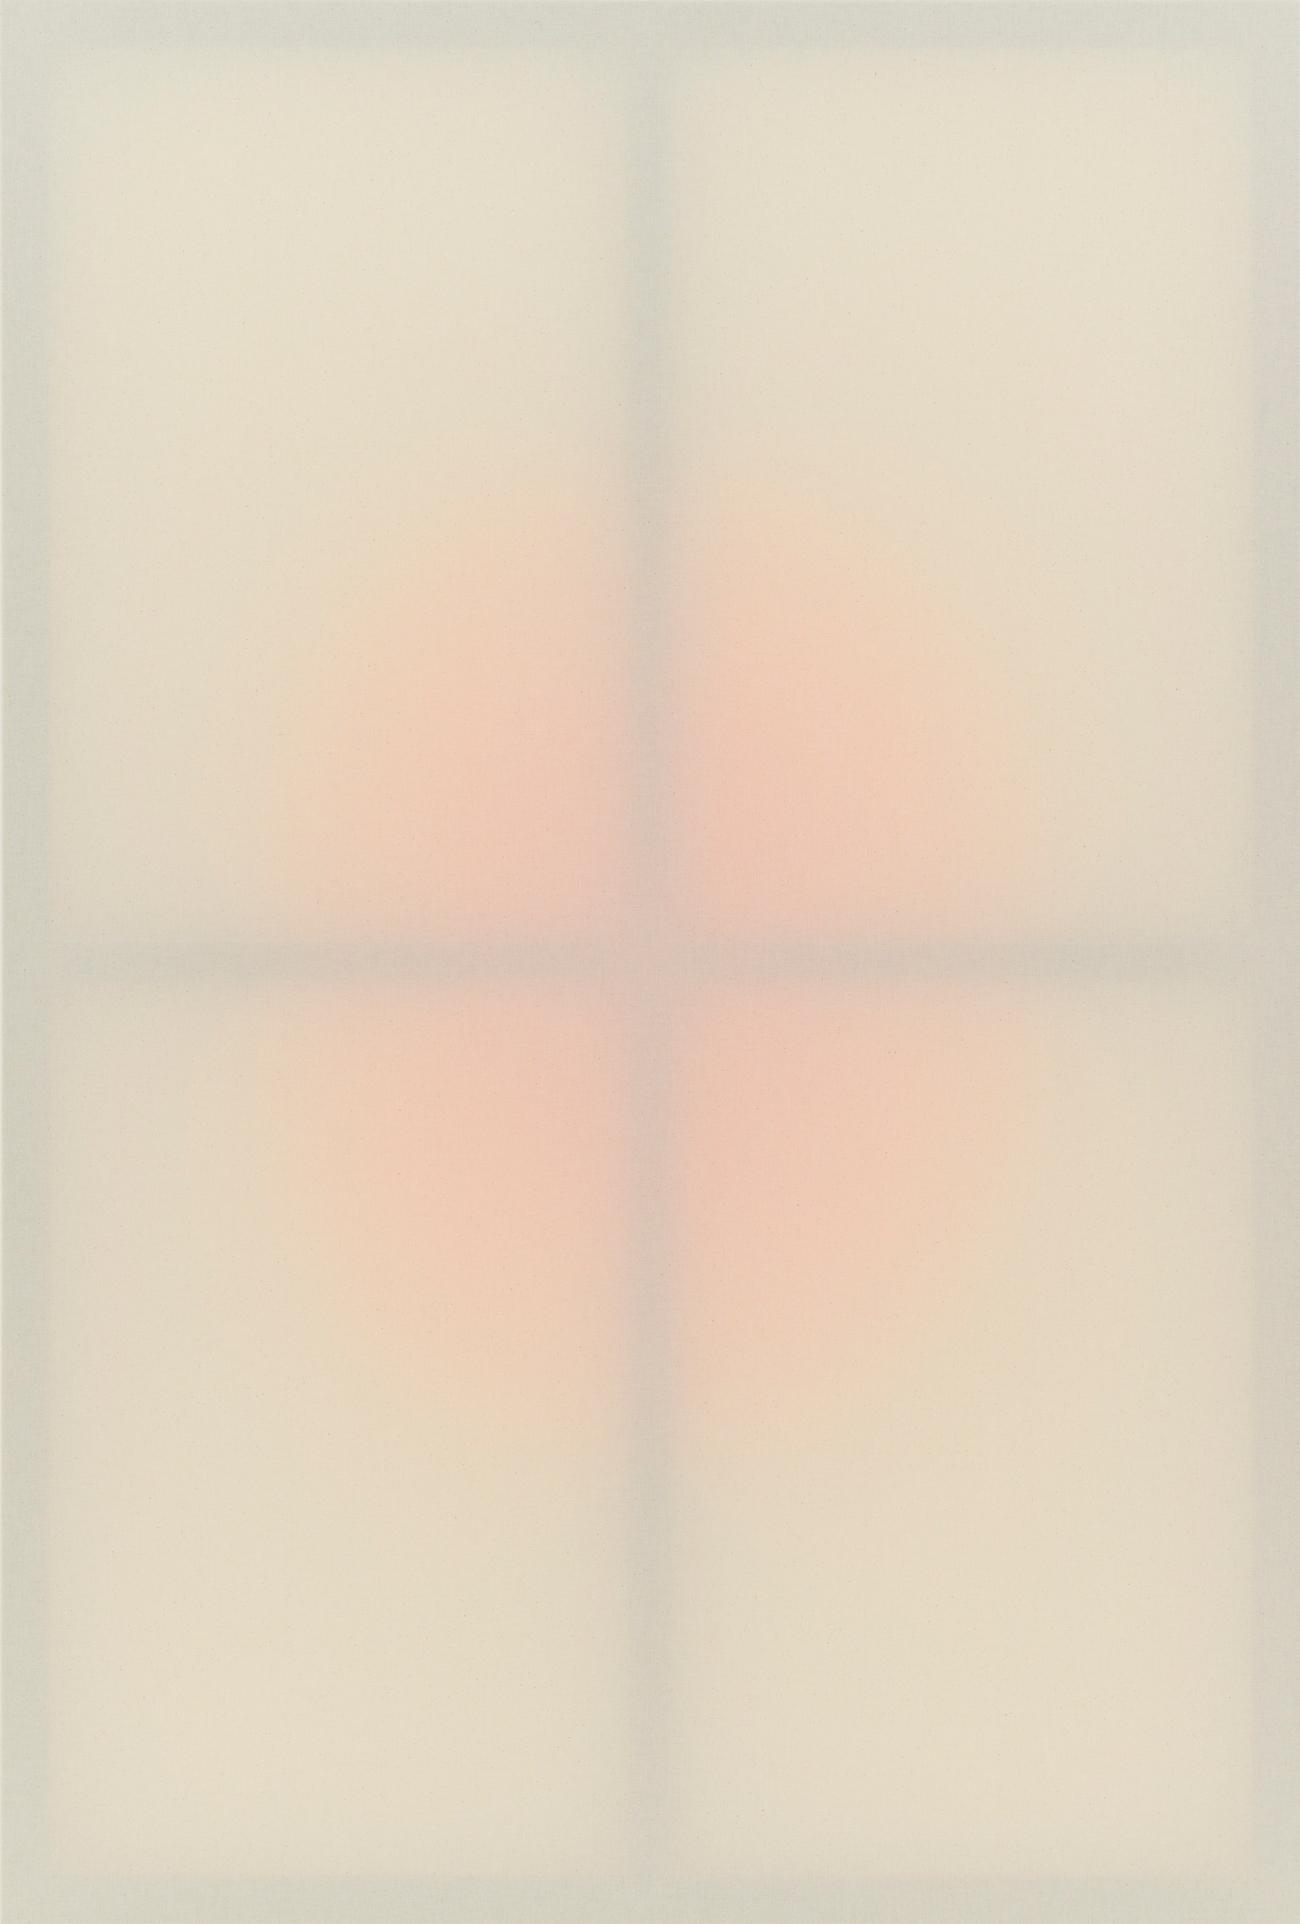 Daniel-Schubert,-untitled-(shimmer-series-nc3),-Acrylic-on-canvas,-155-x-105